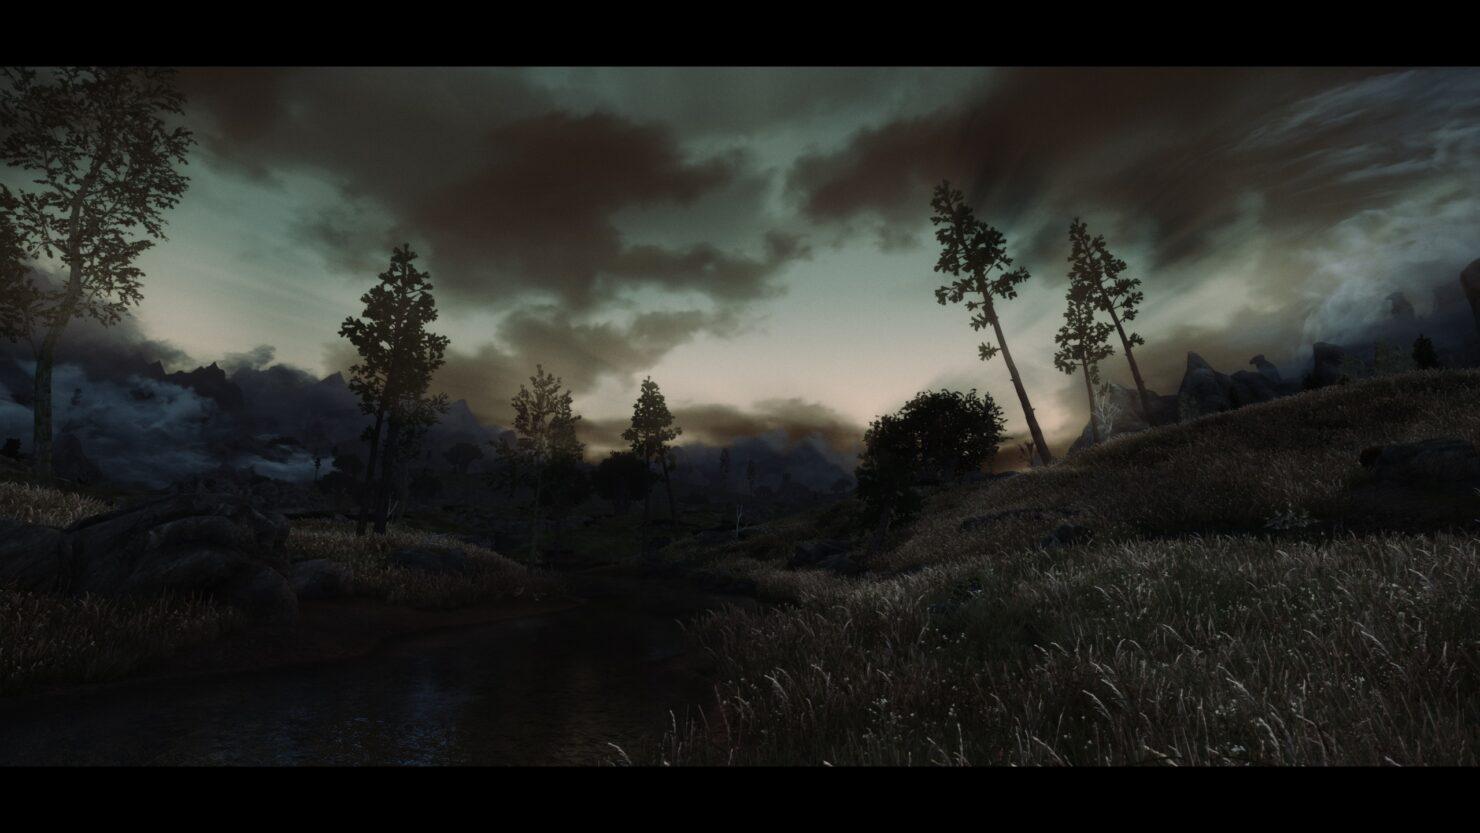 skyrim-special-edition-mod-ominous-enb-mod-3